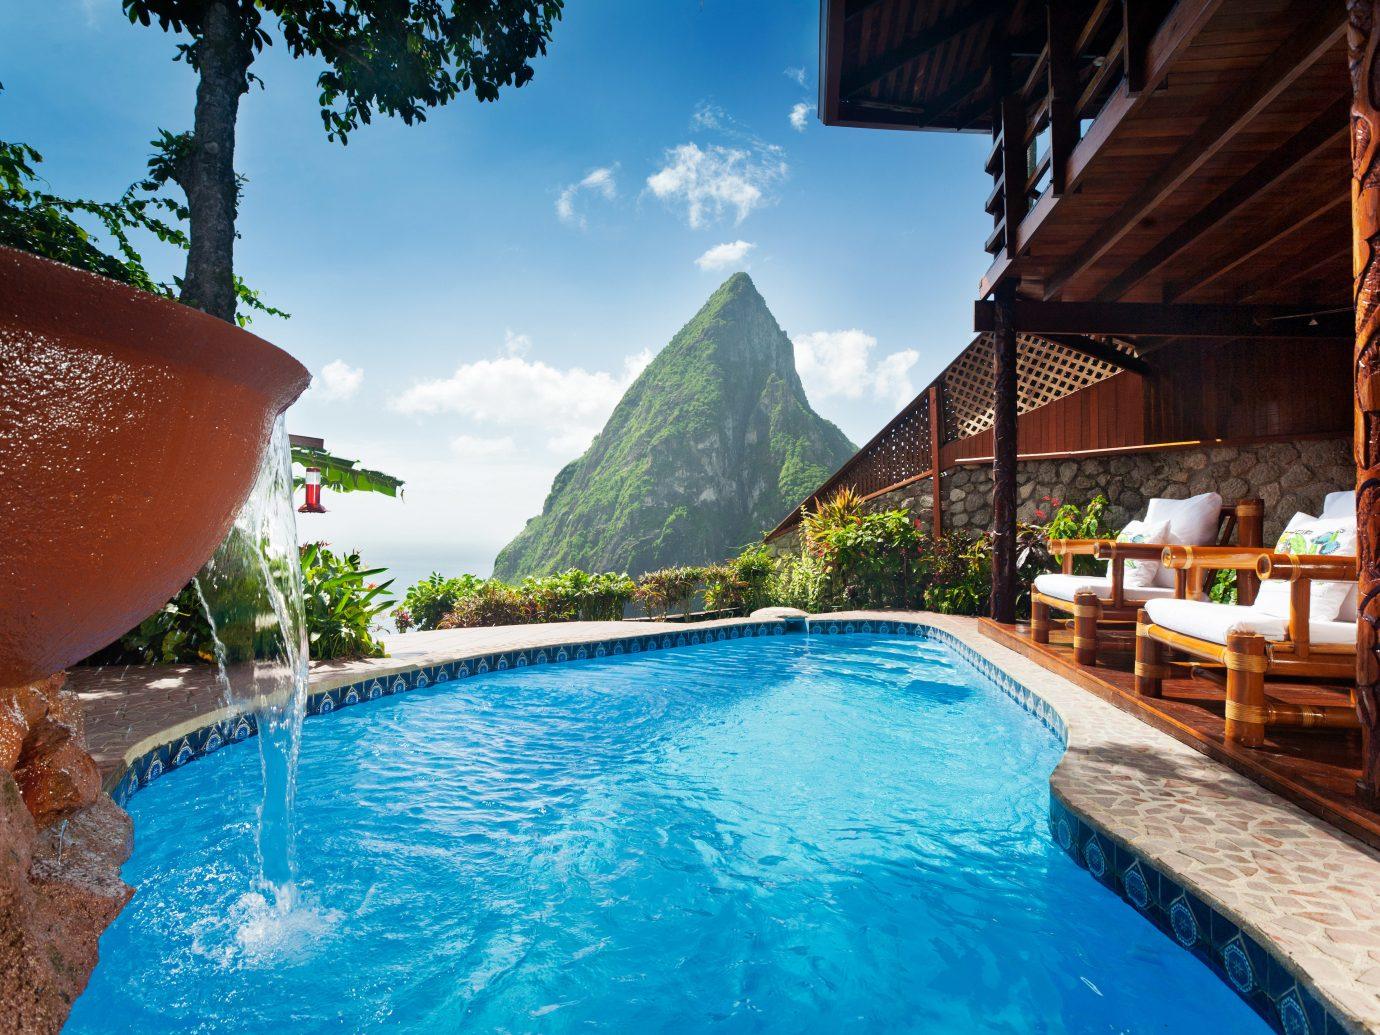 Adult-only Honeymoon Hotels Luxury Luxury Travel Play Pool Resort Romance Scenic views sky water swimming pool leisure vacation estate resort town Villa backyard swimming